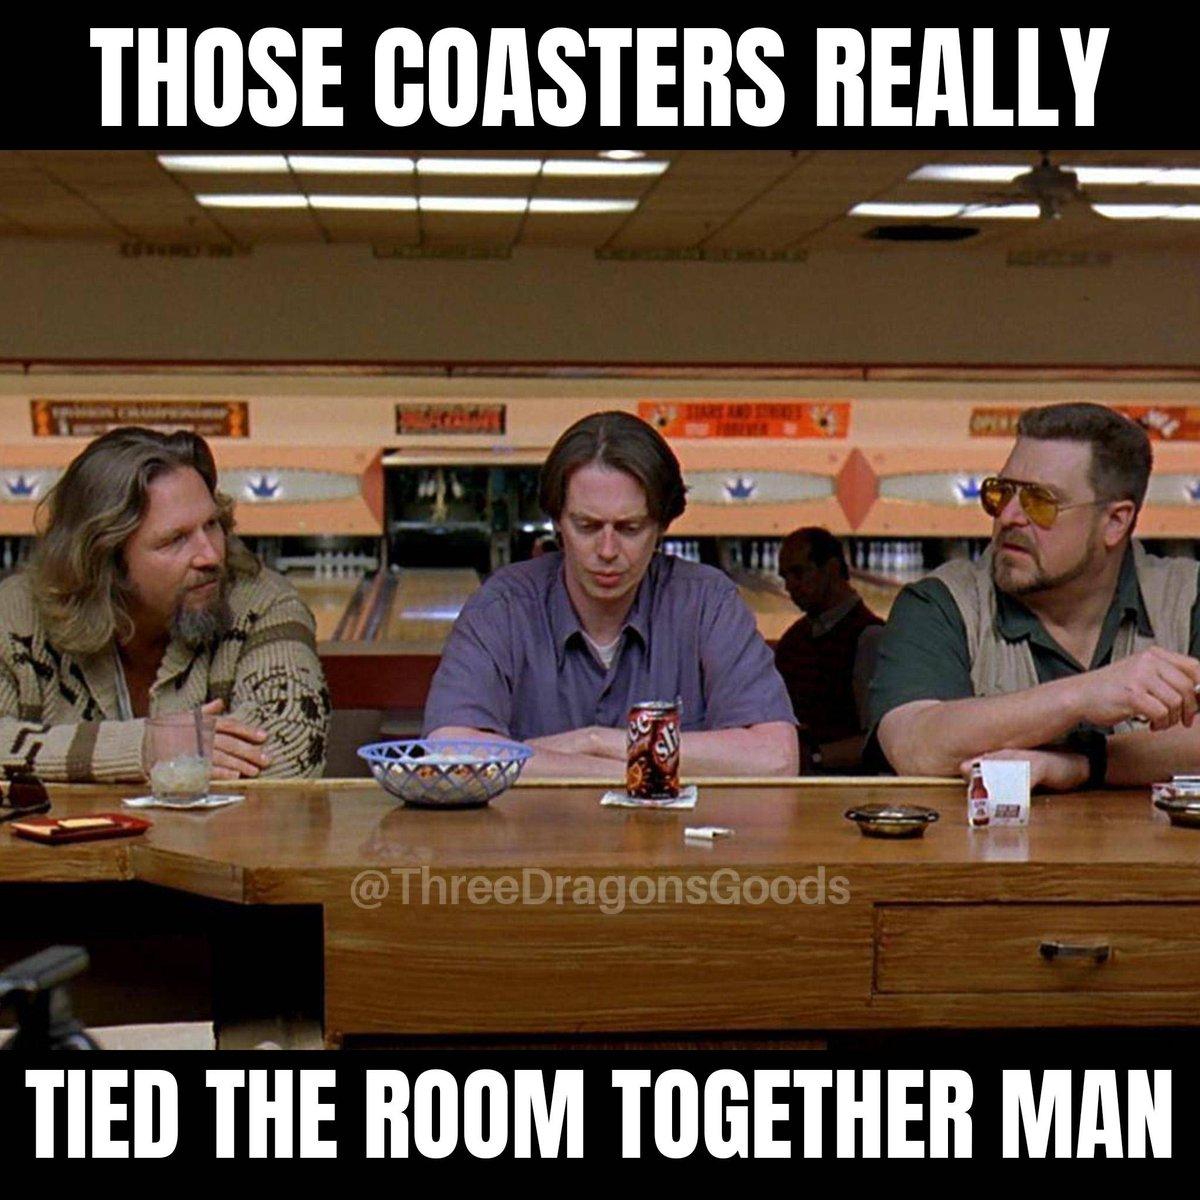 For every room!  http://ow.ly/R26r30qhaf6 #ThreeDragonsGoods #Etsy #EtsyShop #EtsySeller #Shopping #Decor #coasters #coasterset #drinkcoasters #meme #memes #memesdaily #durable #useacoaster #protectyourtable #TheDude #TheBigLebowski #JeffBridges #JohnGoodman #SteveBuscemipic.twitter.com/h05odqiHUx